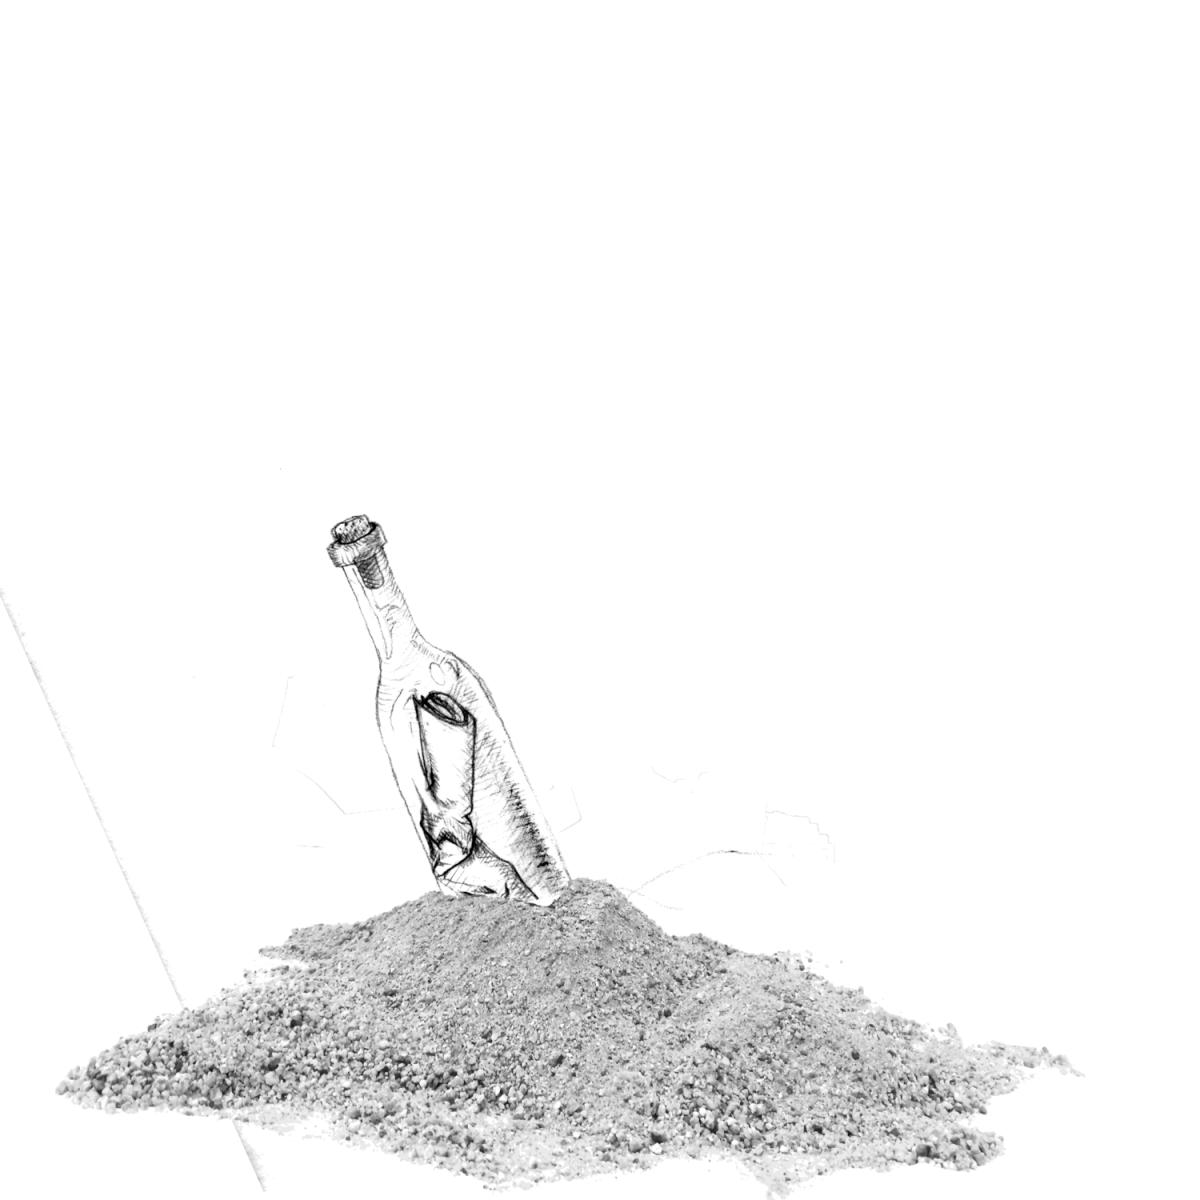 4. Donny Trumpet & The Social Experiment - Surf